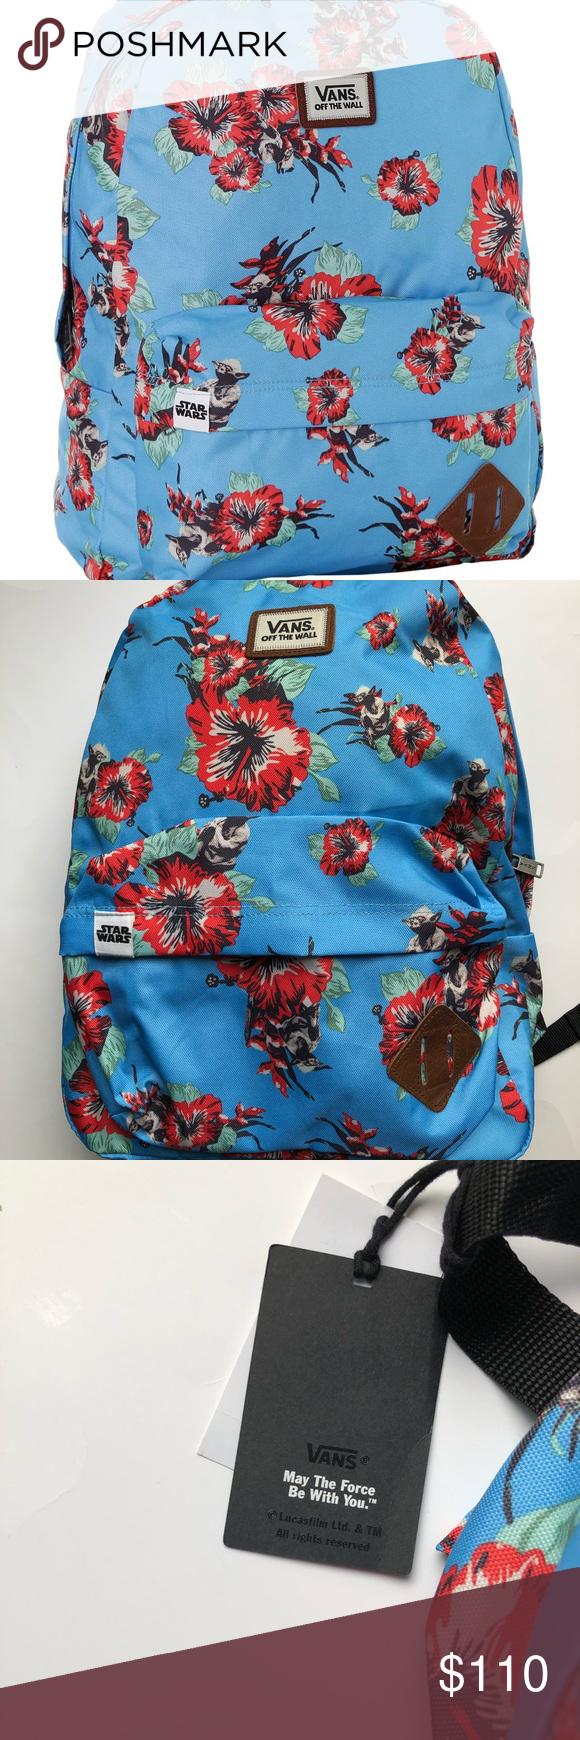 093cba32e8 NWT Disney Star Wars vans backpack ft yoda NWT Backpack from Disney Star  Wars vans line that is sold out Vans Bags Backpacks